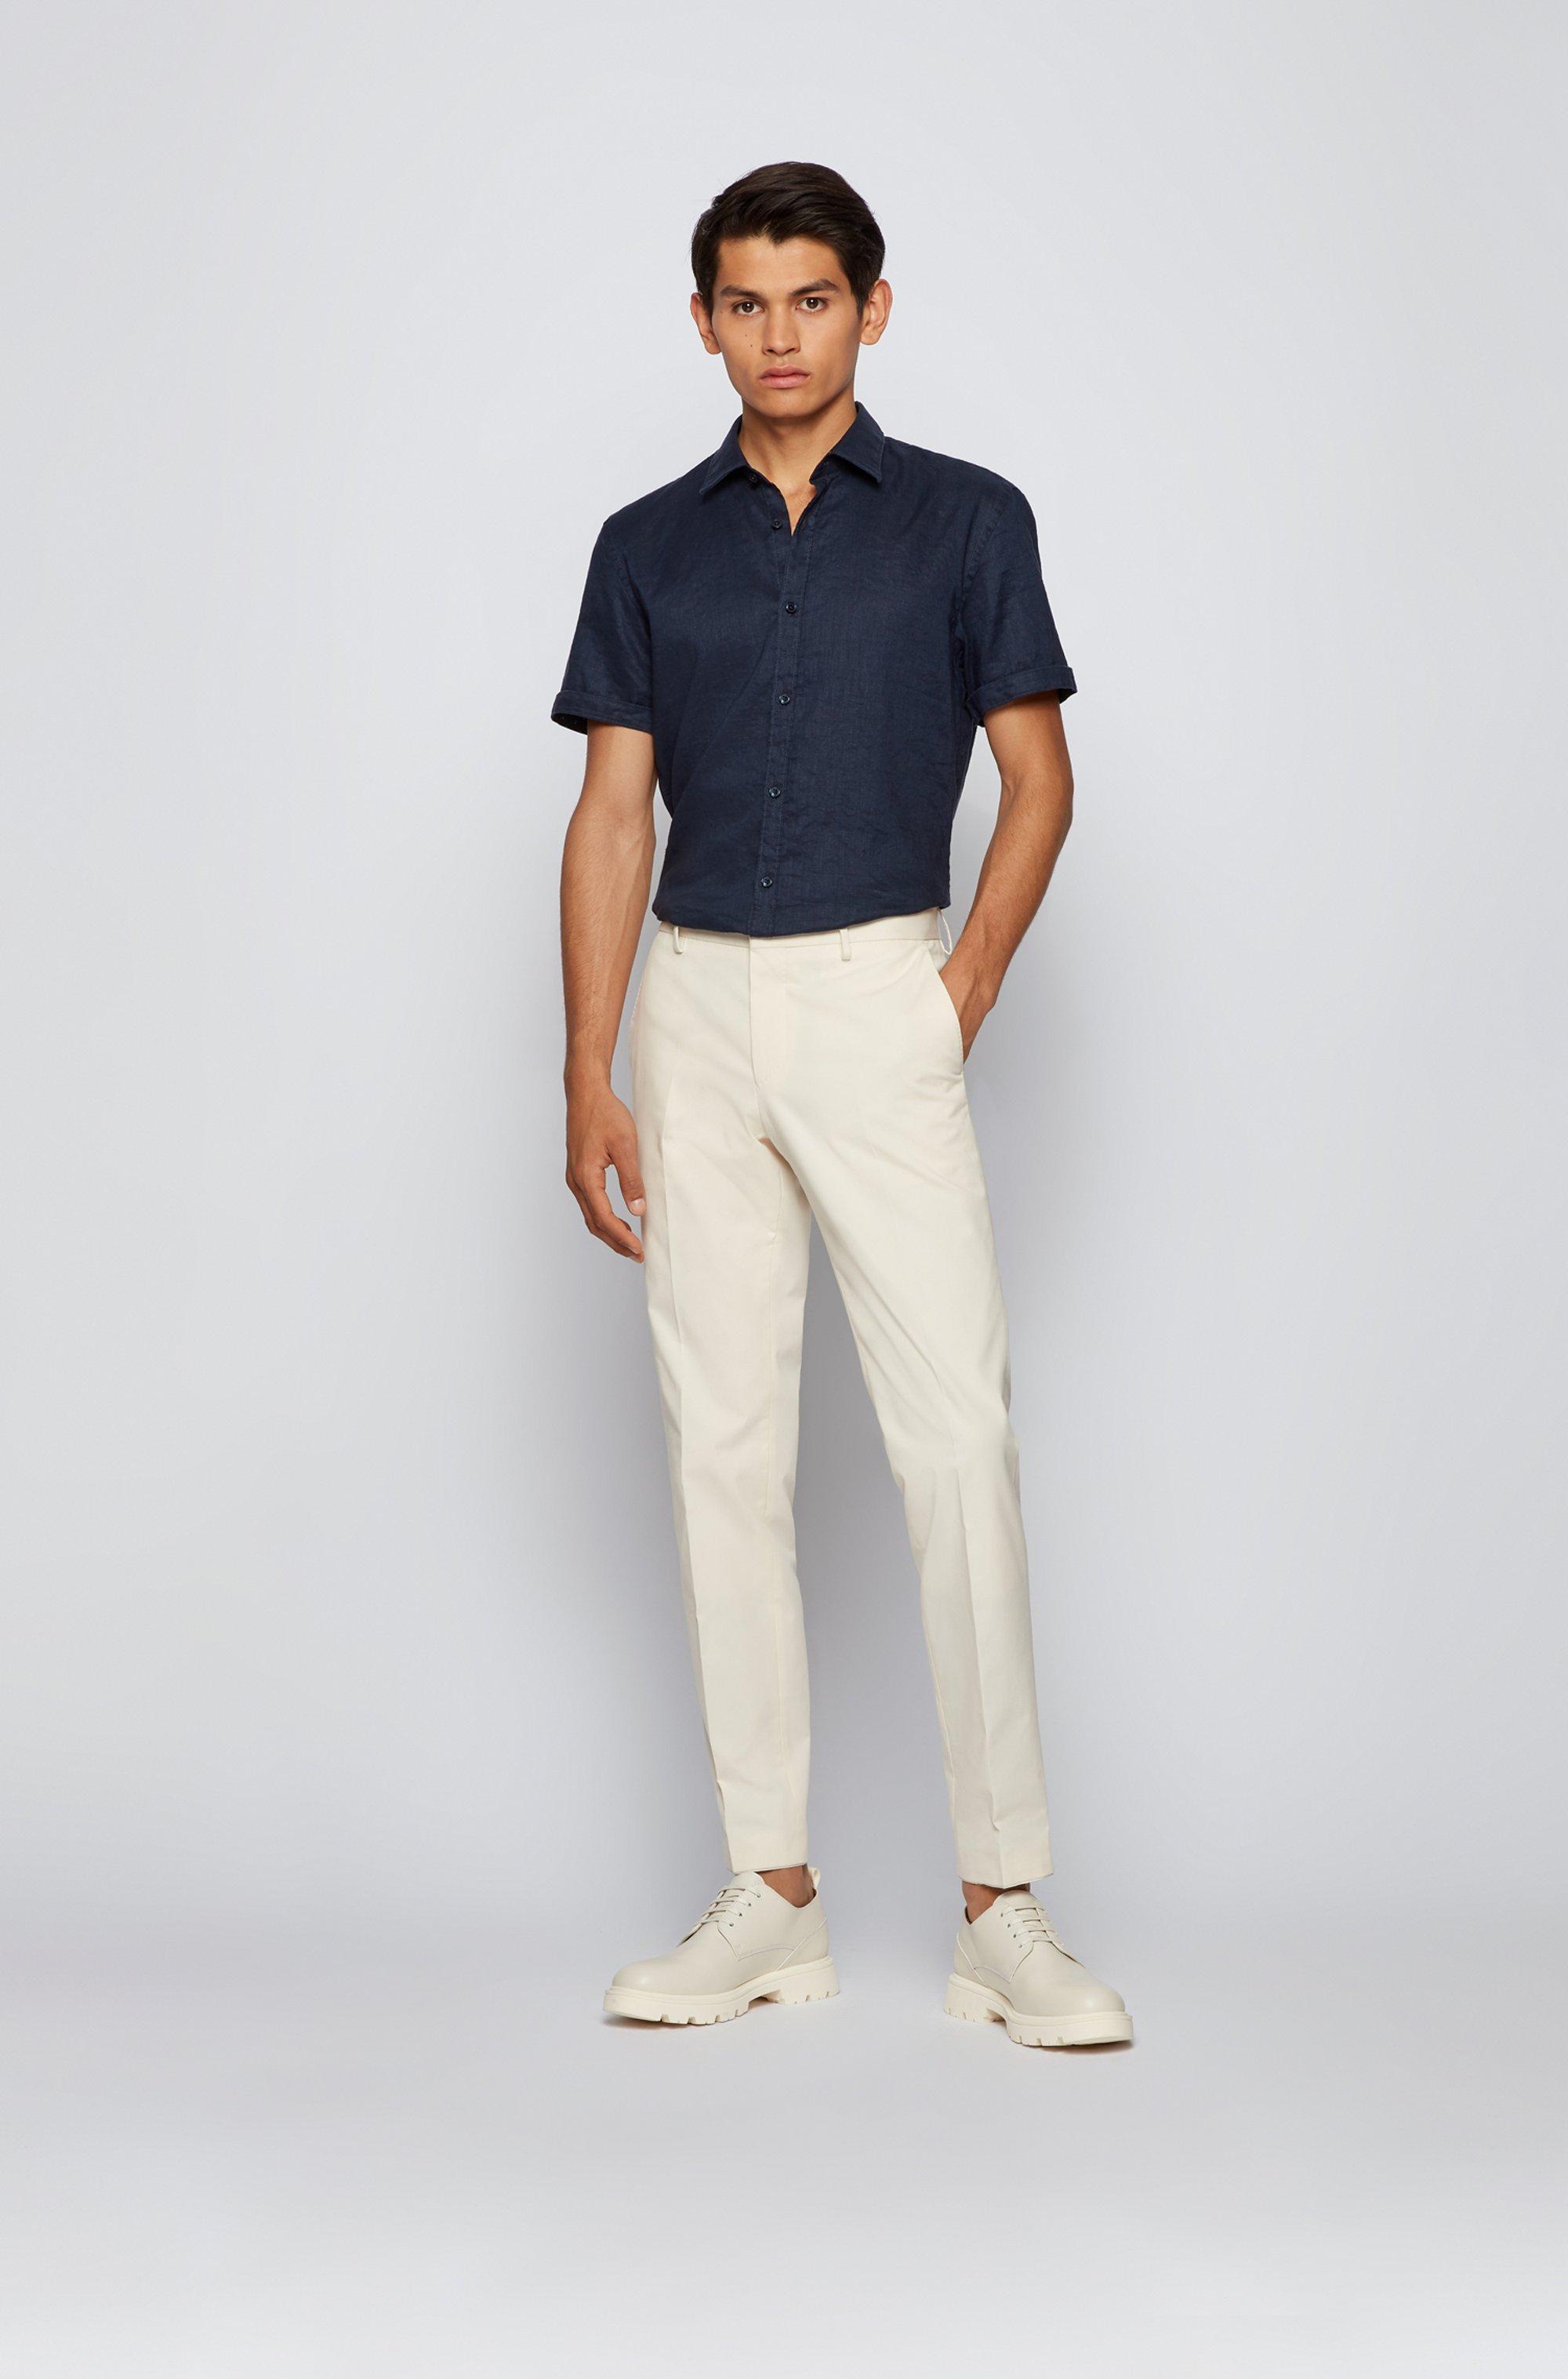 Short-sleeved slim-fit shirt in stretch linen